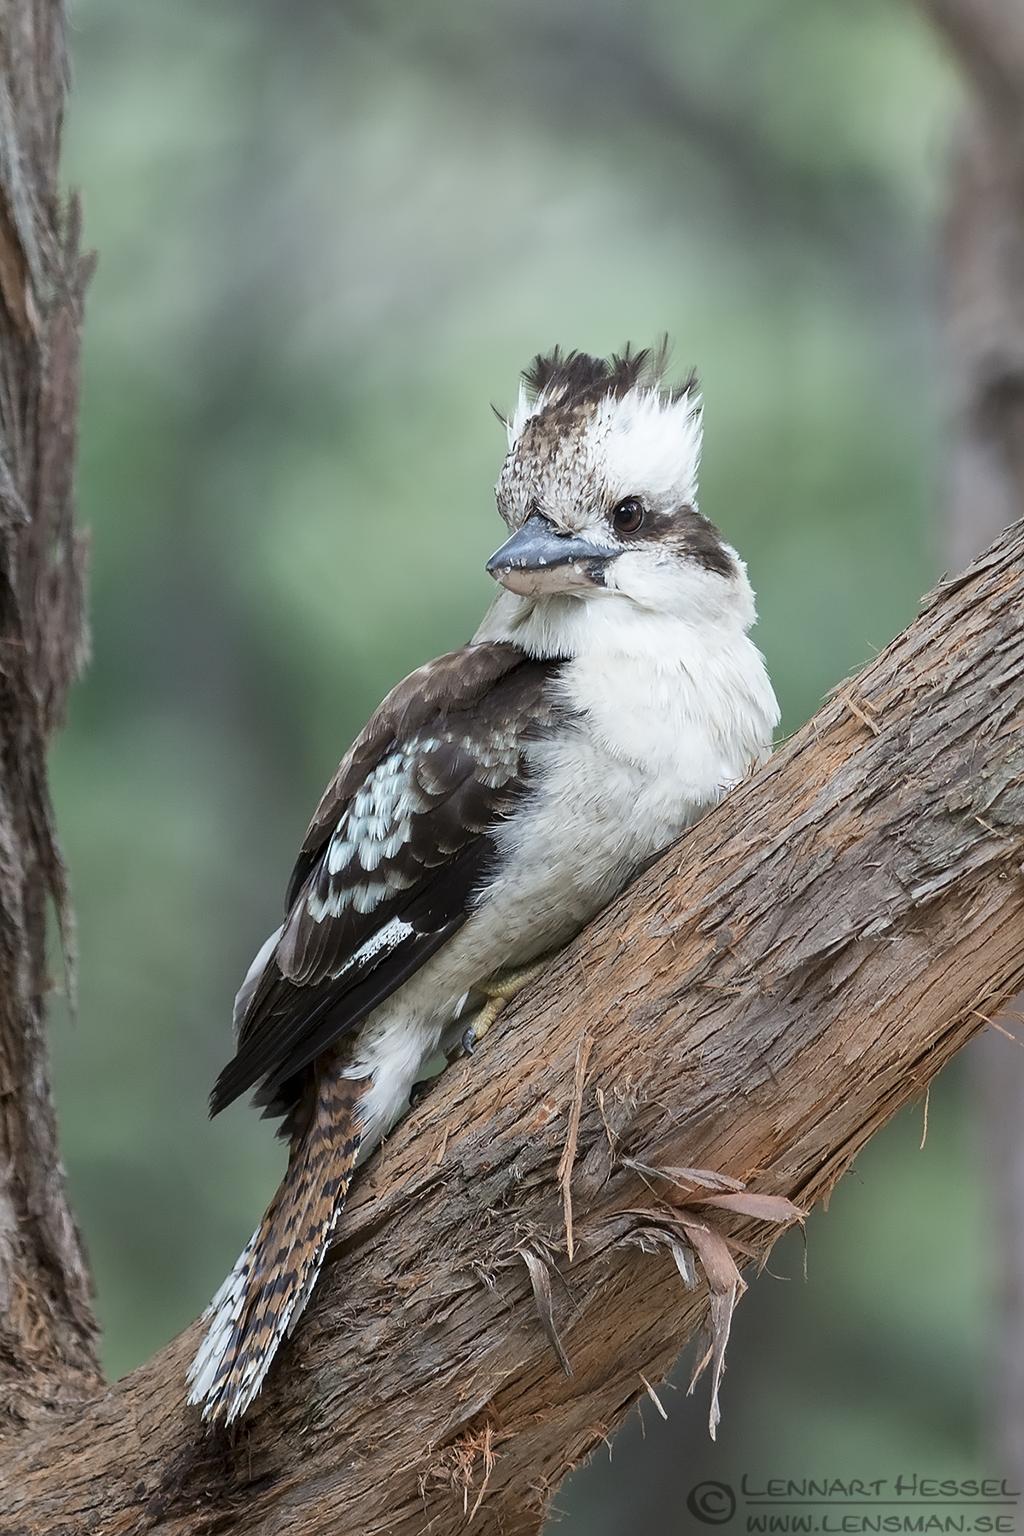 Laughing Kookaburra wild bird national geographic